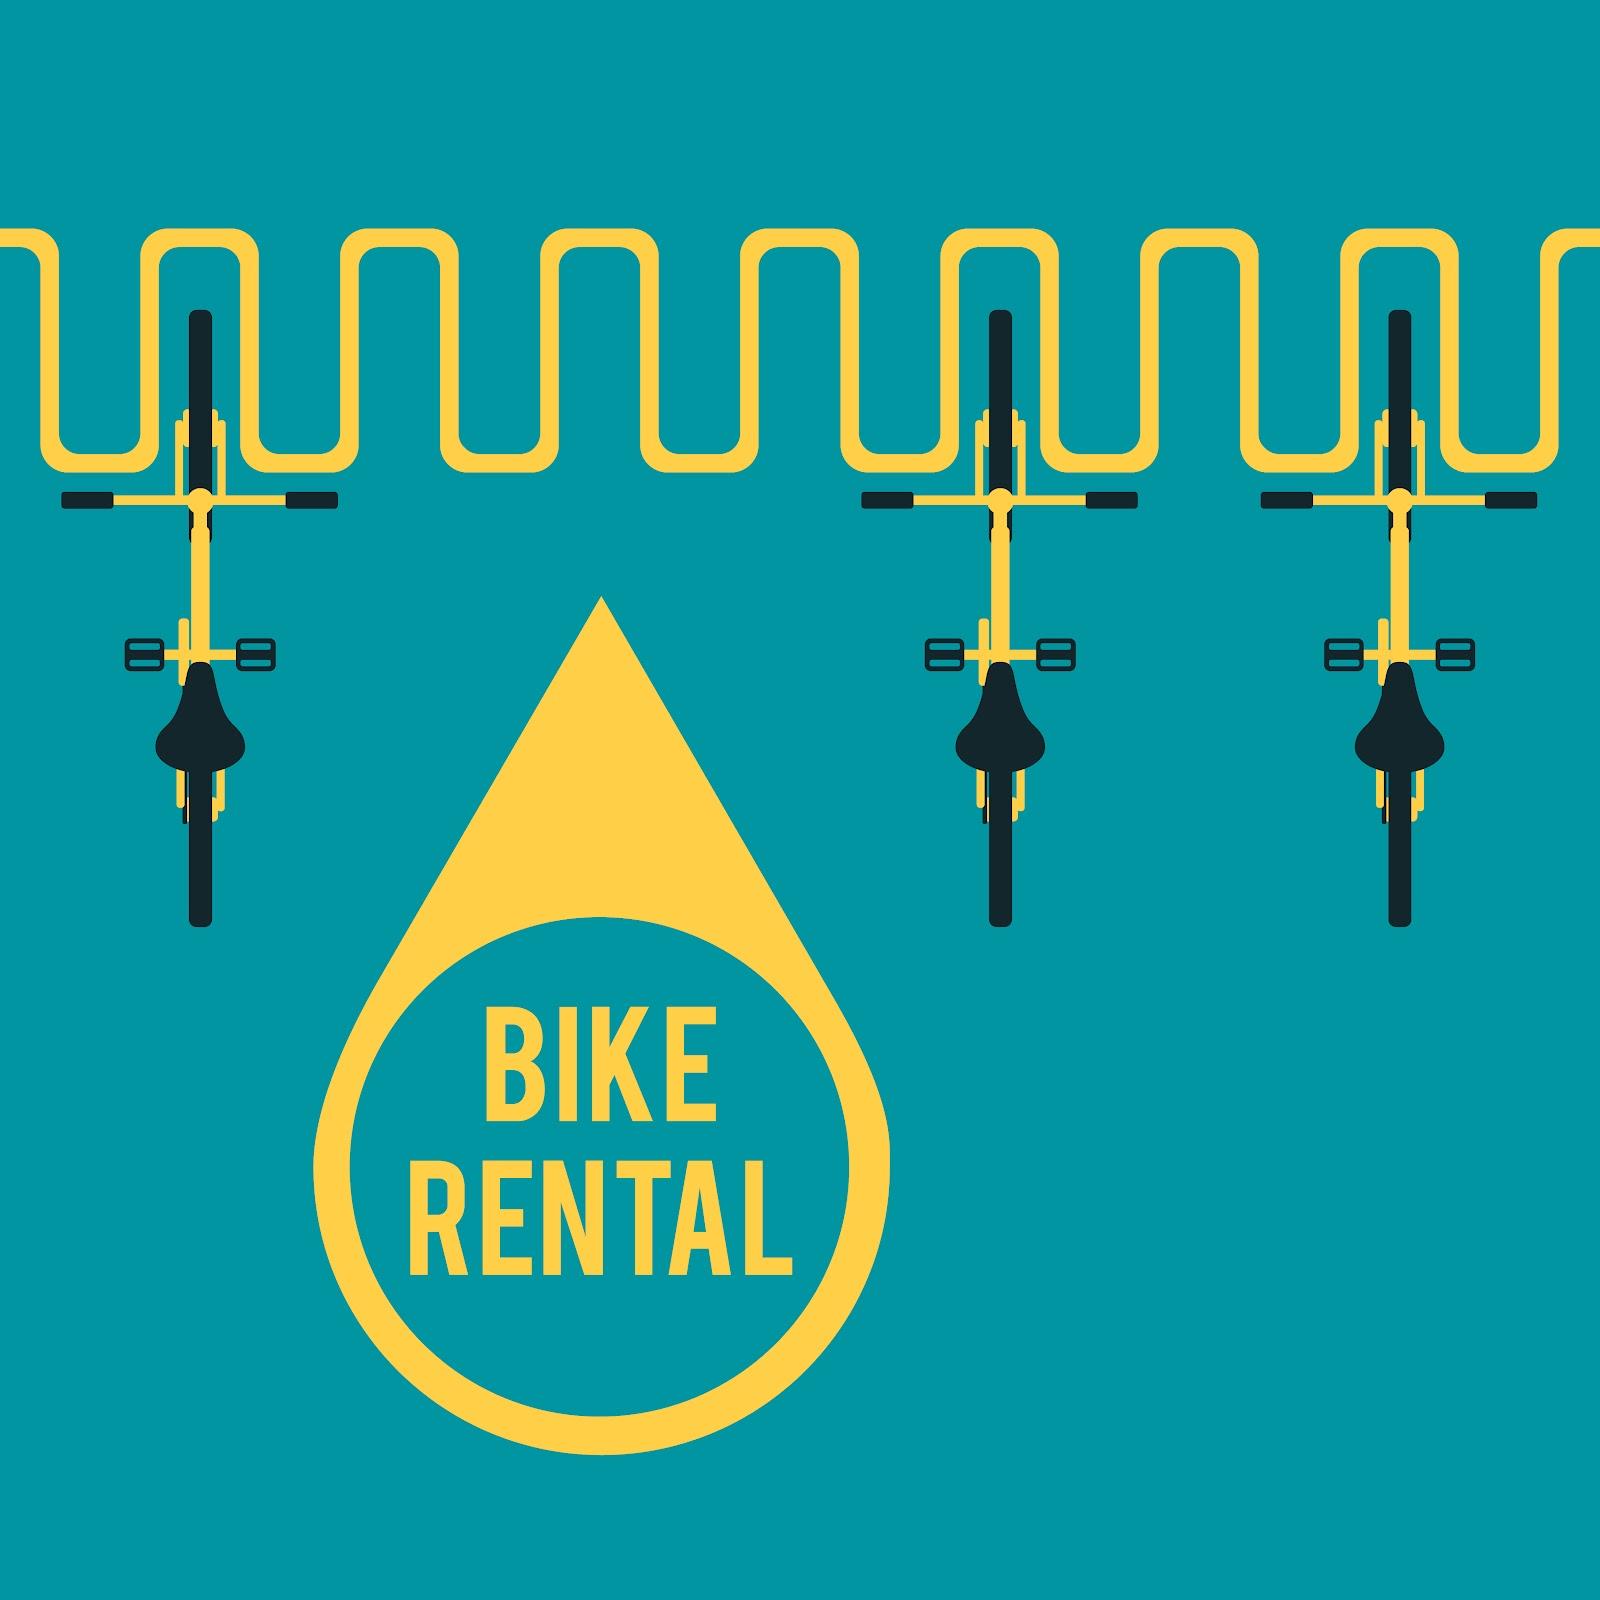 Bike rental- Jugnoo